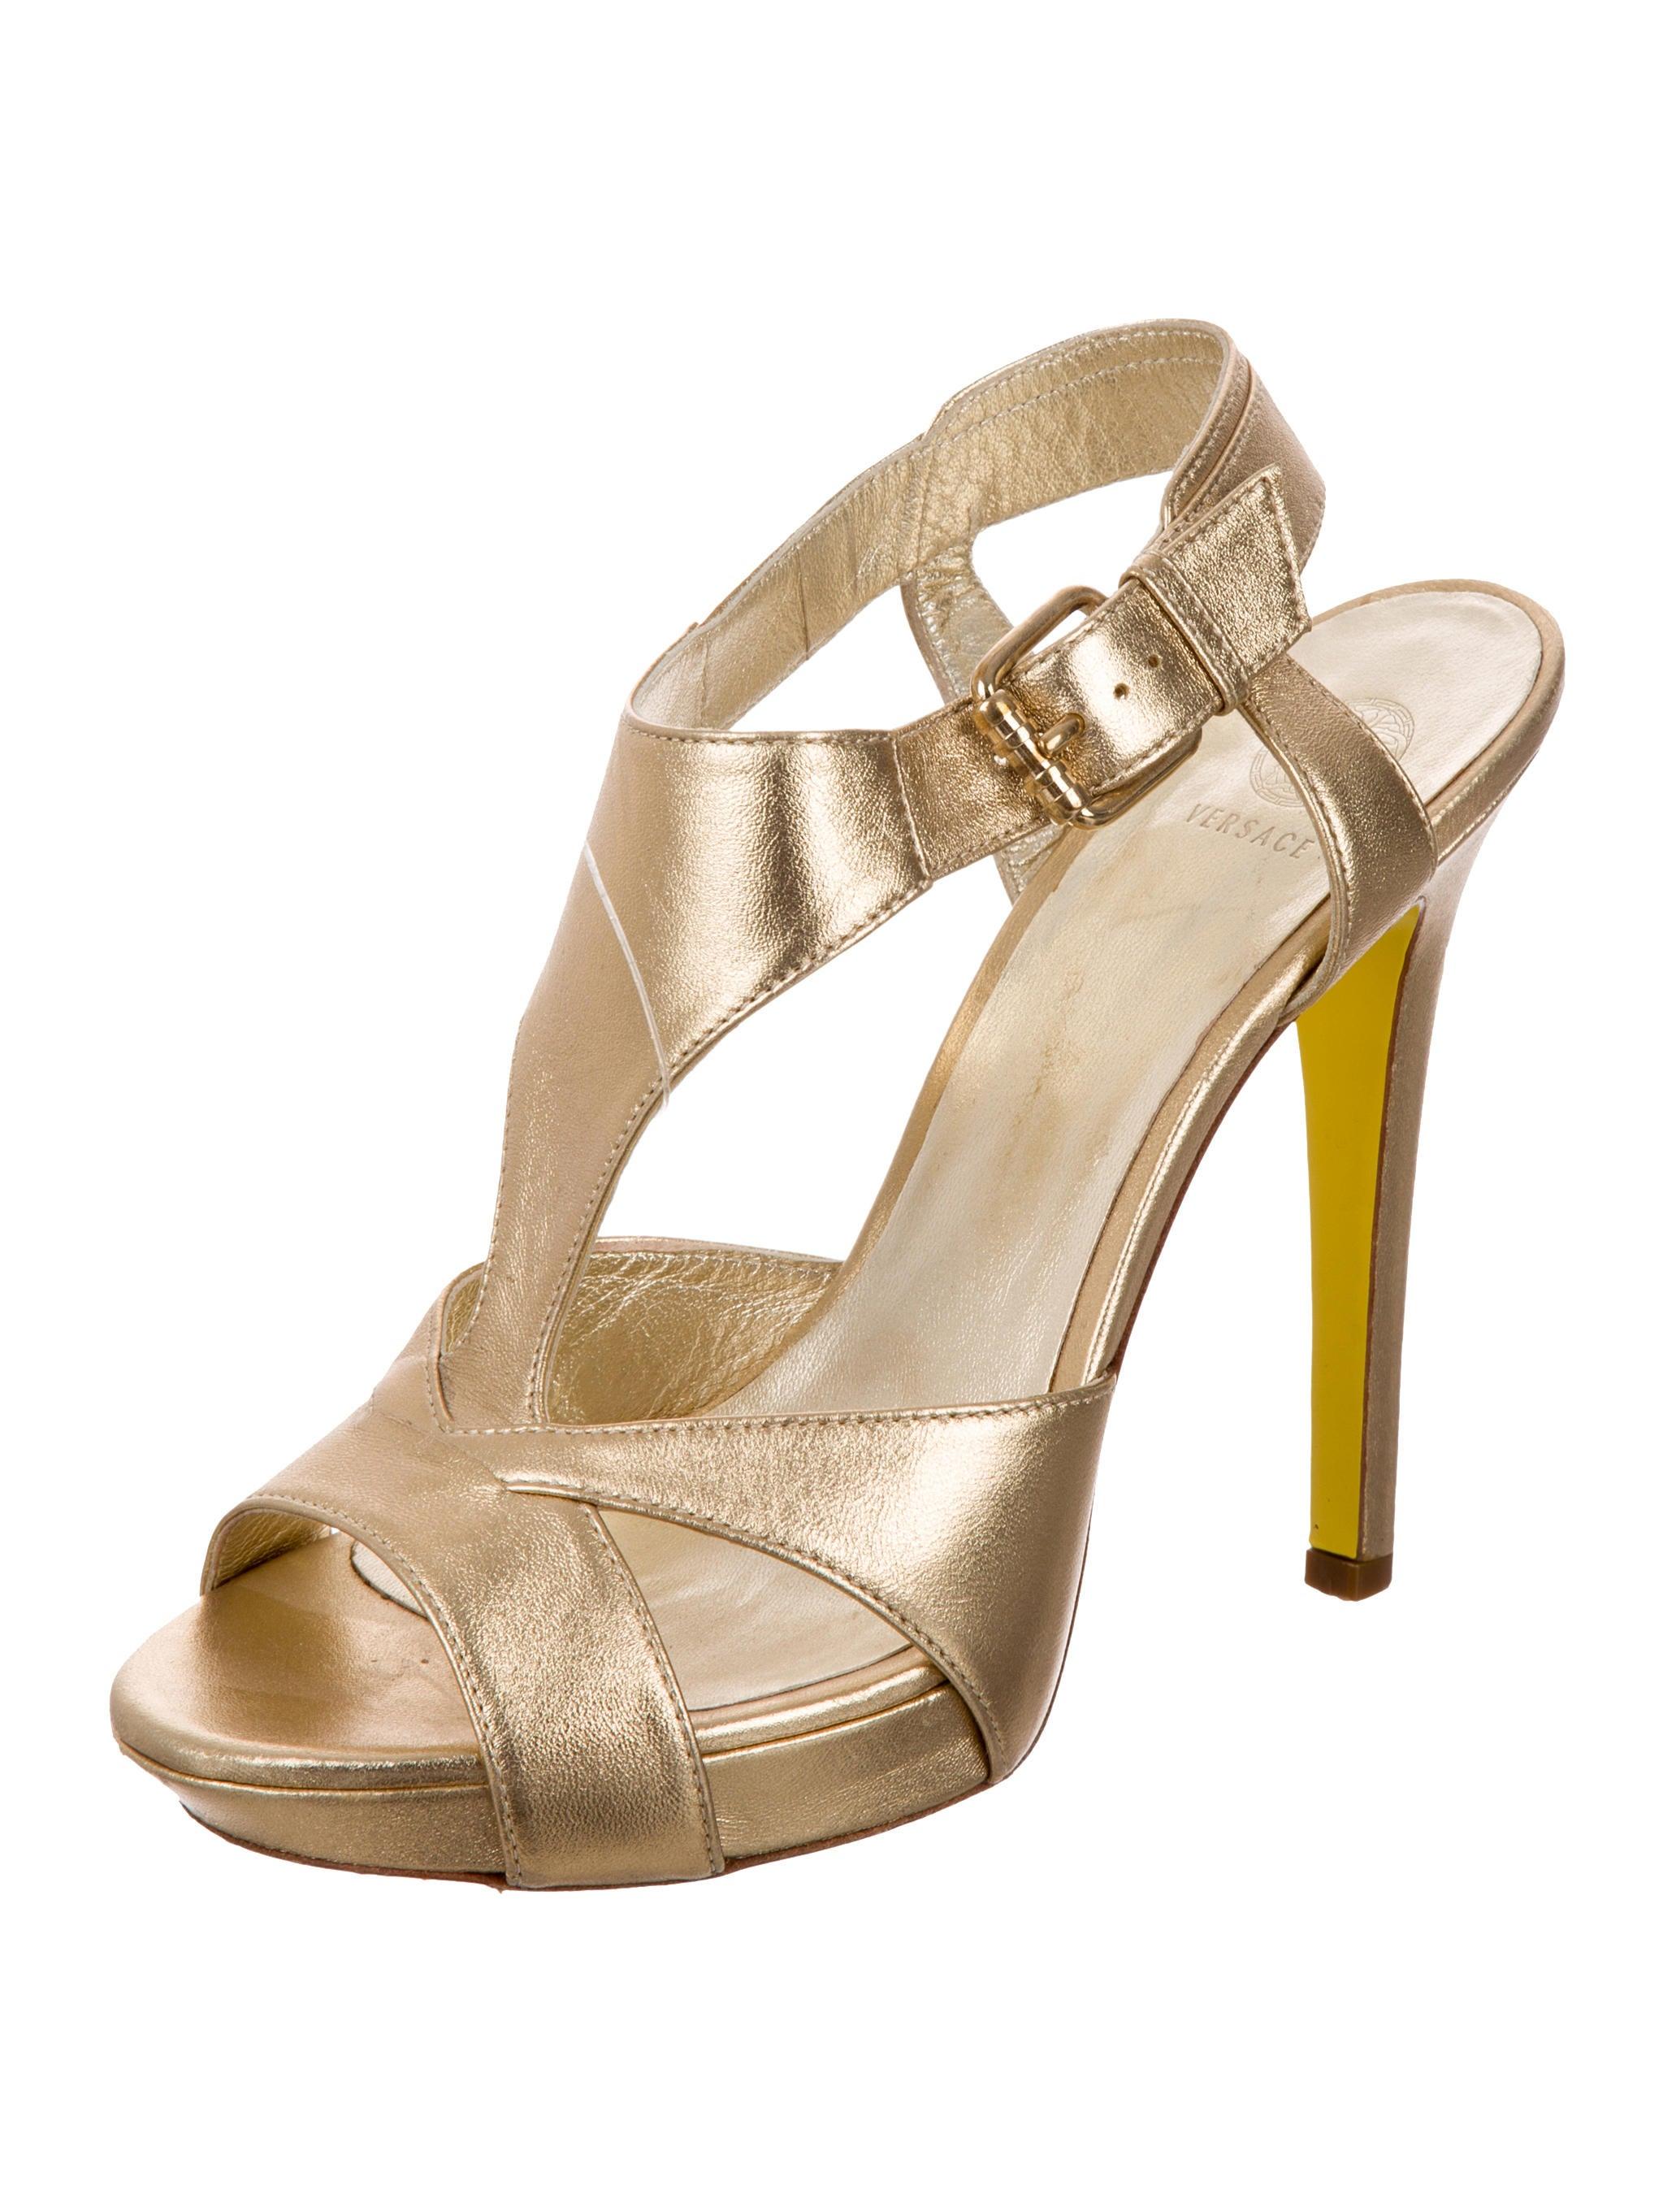 Versace Metallic Cutout Sandals - Shoes - VES31143 | The RealReal